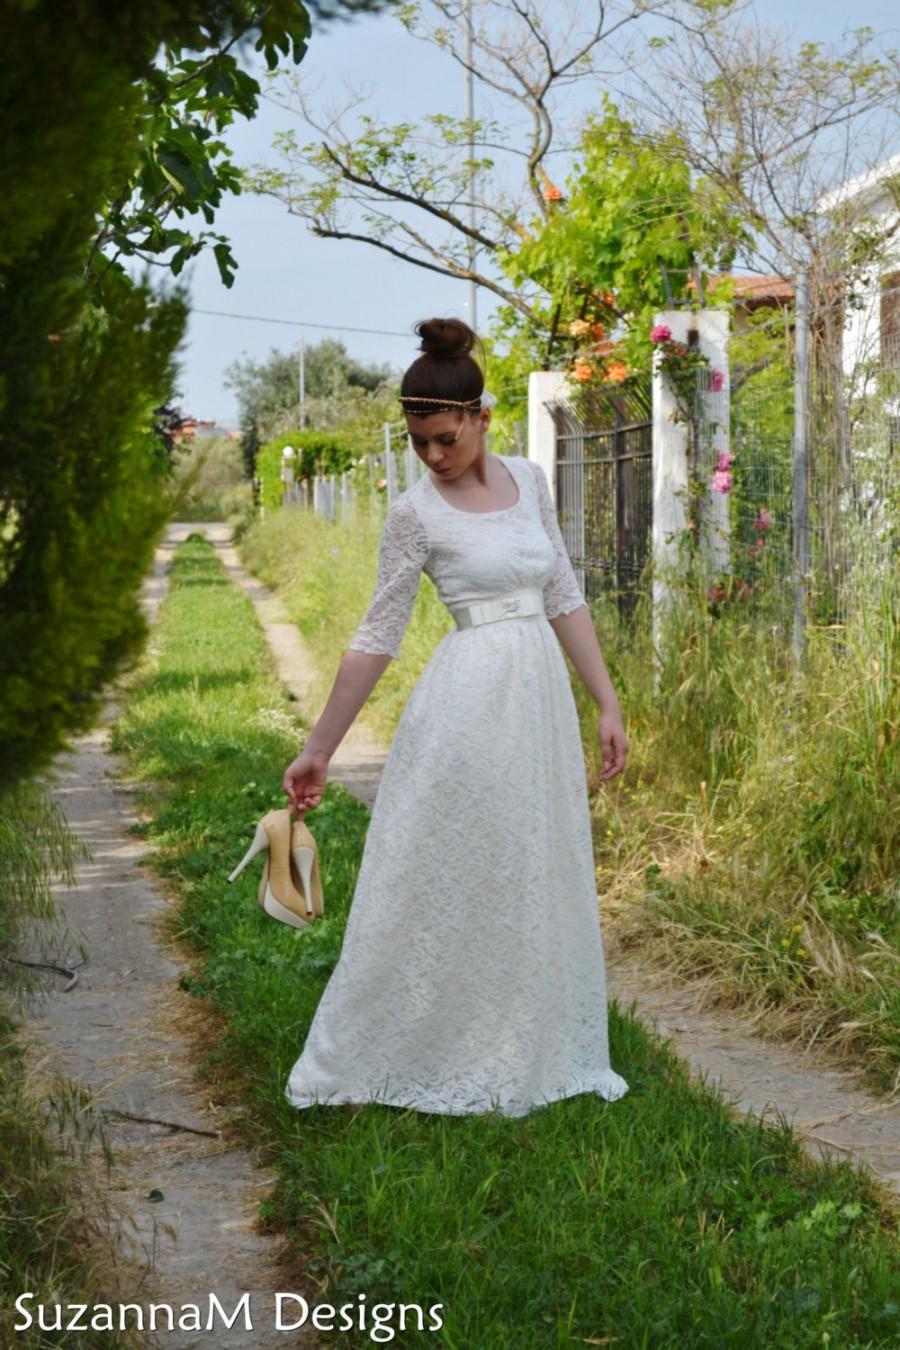 Mariage - Vintage Wedding Dress, Lace Wedding Dress, SuzannaM Designs, Long Sleeve Wedding Dress, Vintage Wedding Gown, Vintage Bridal Dress, Maryse